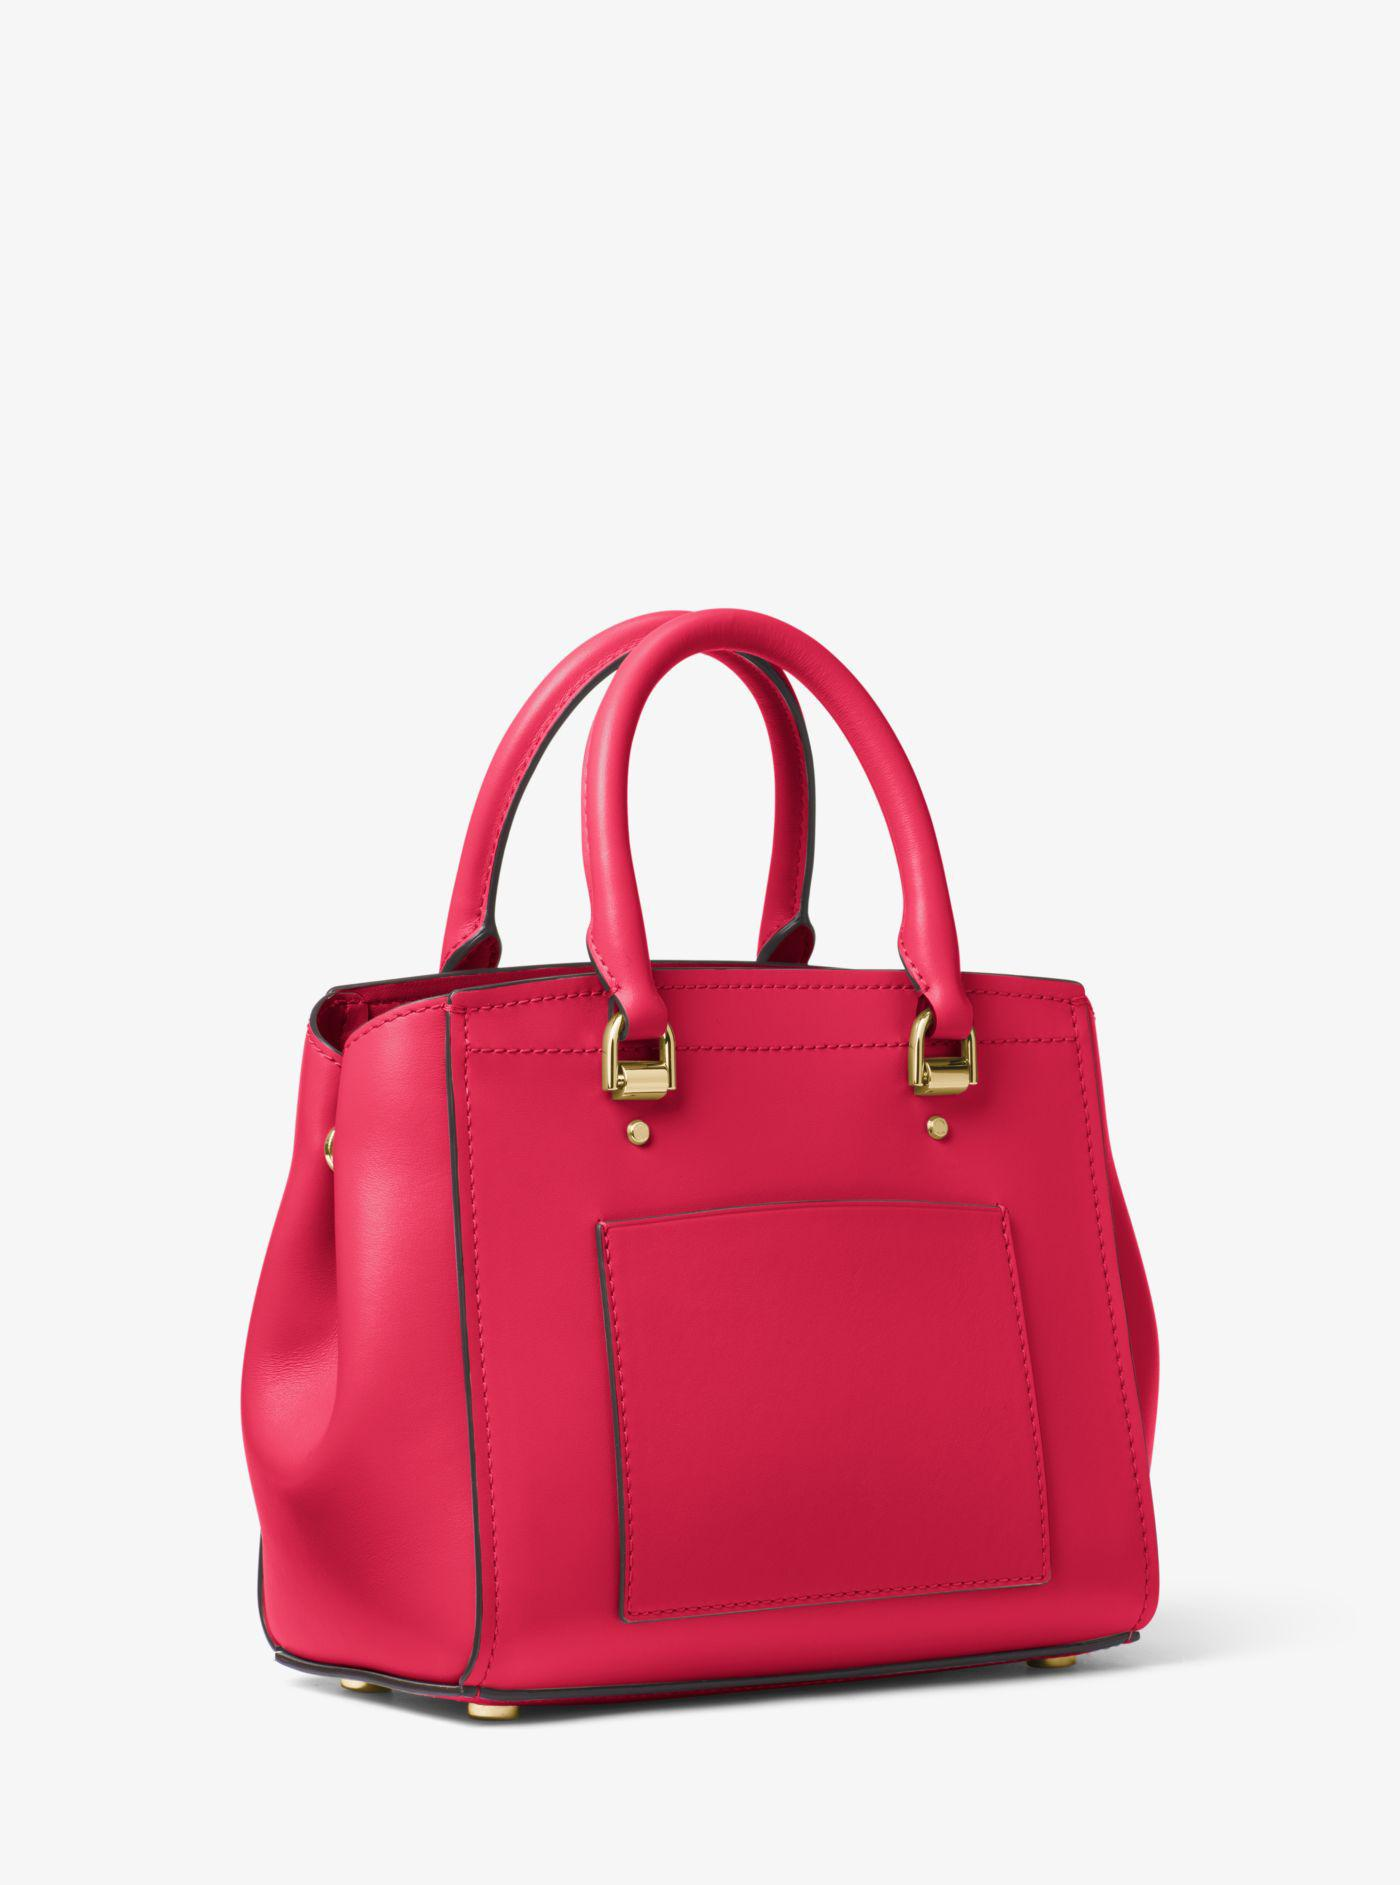 1efd76878a48 Lyst - Michael Kors Benning Medium Leather Satchel in Pink